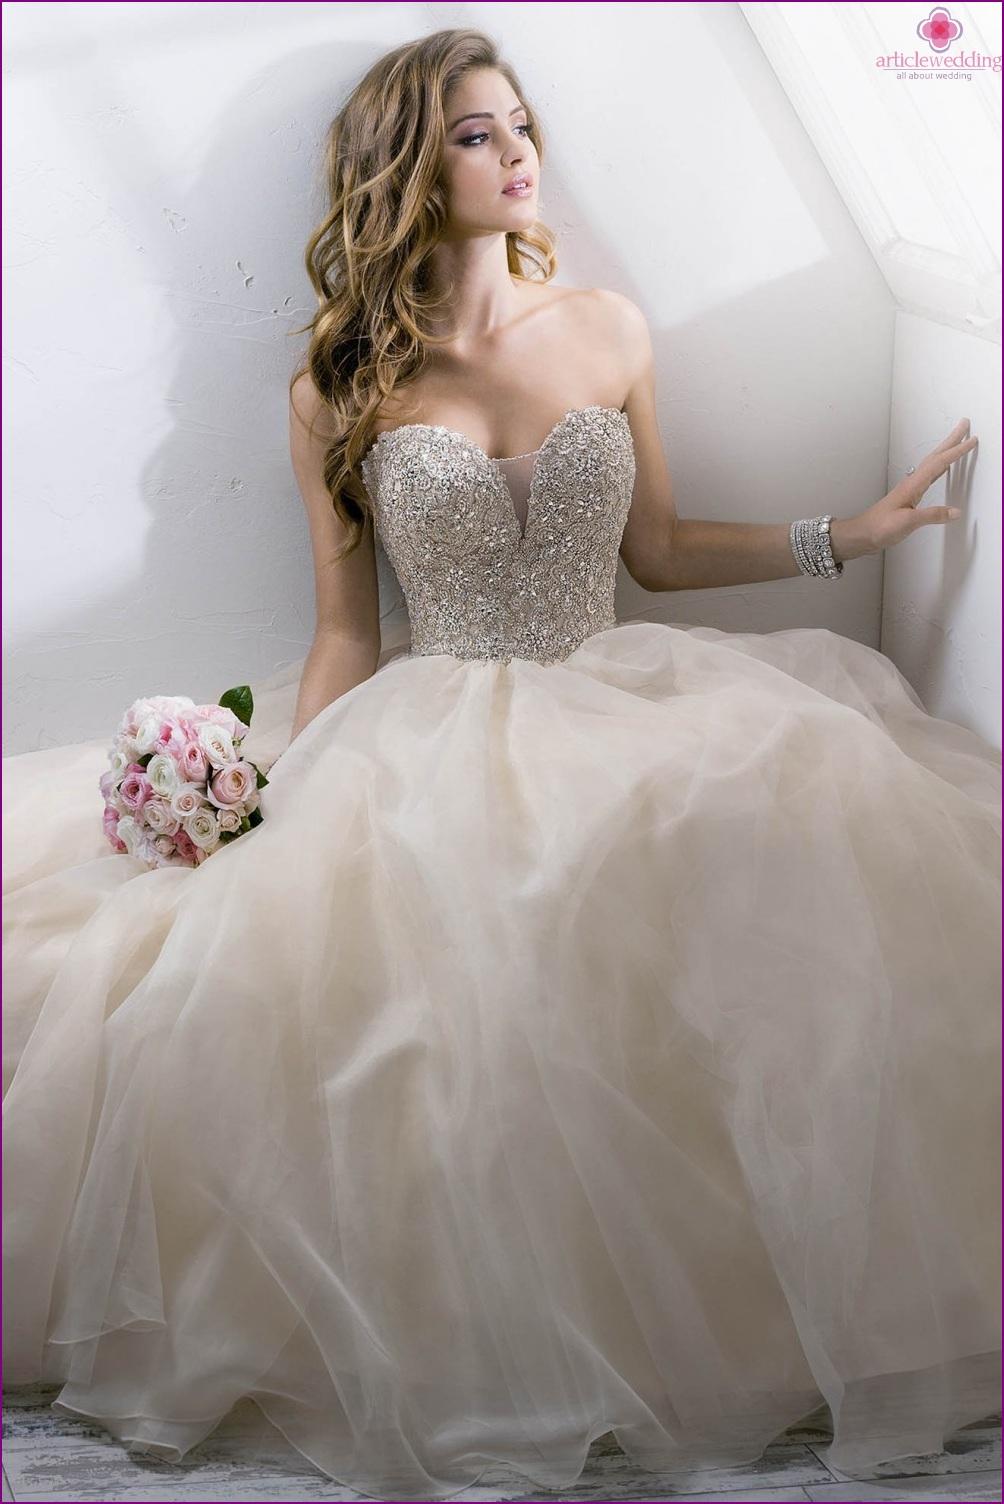 Wedding dress with rhinestones and crystals